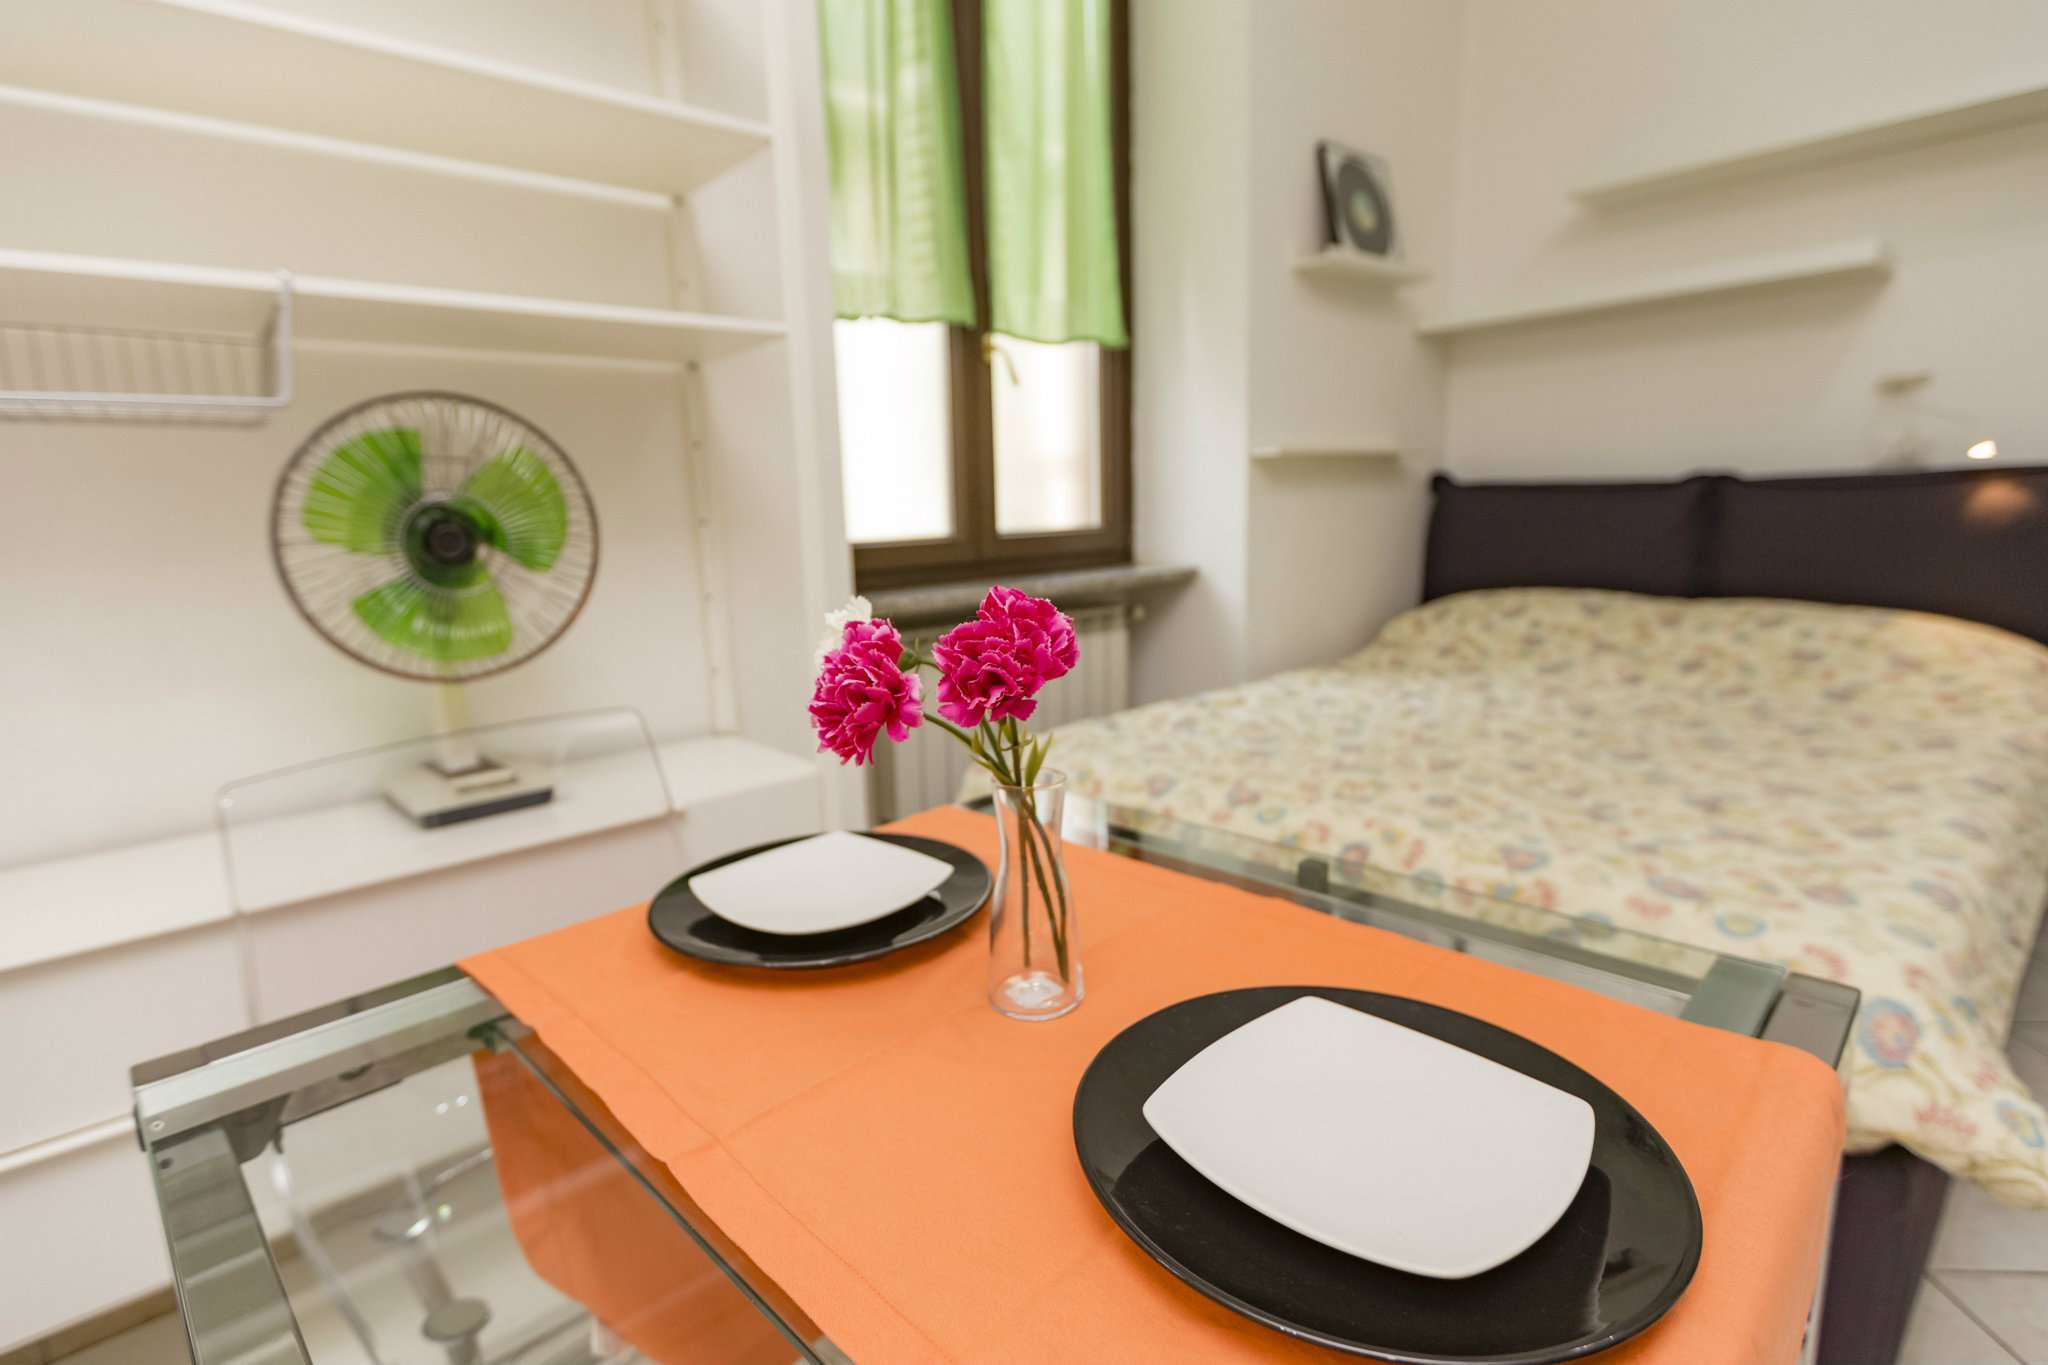 Appartamento in vendita Zona San Salvario - via Saluzzo 17 Torino